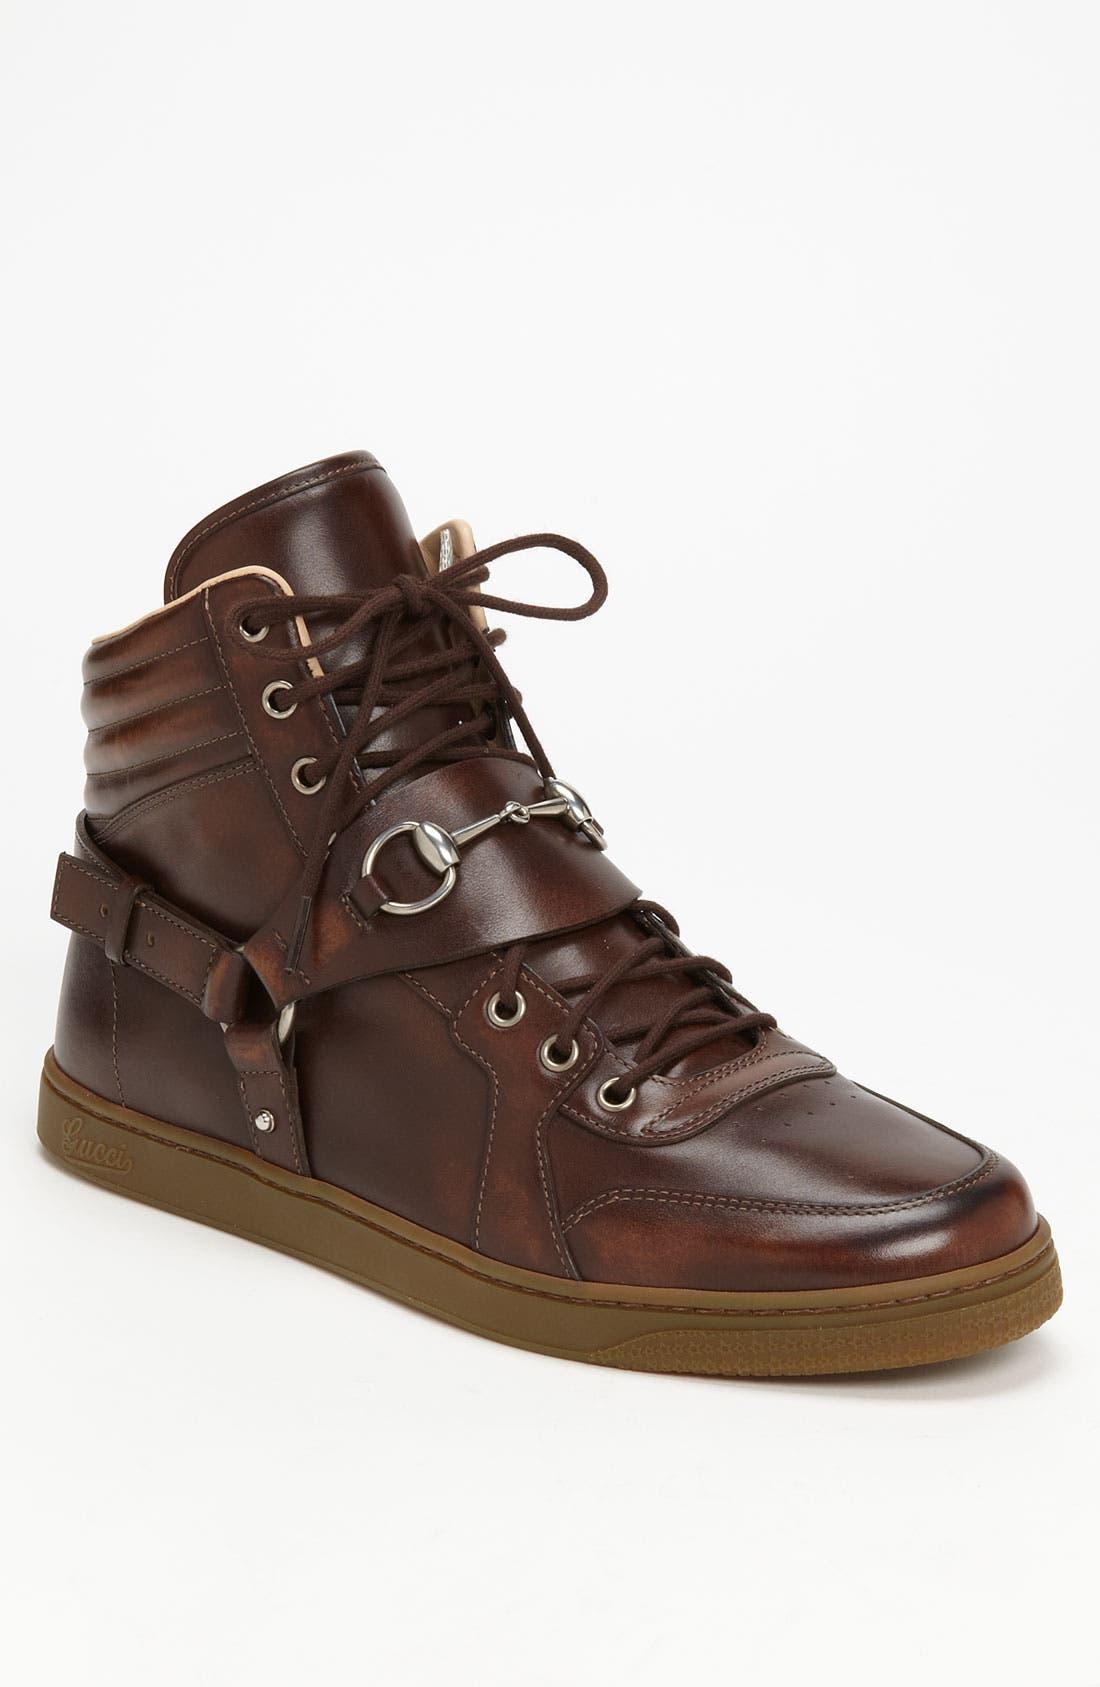 Main Image - Gucci 'Coda - Horse Bit' Sneaker (Online Exclusive)